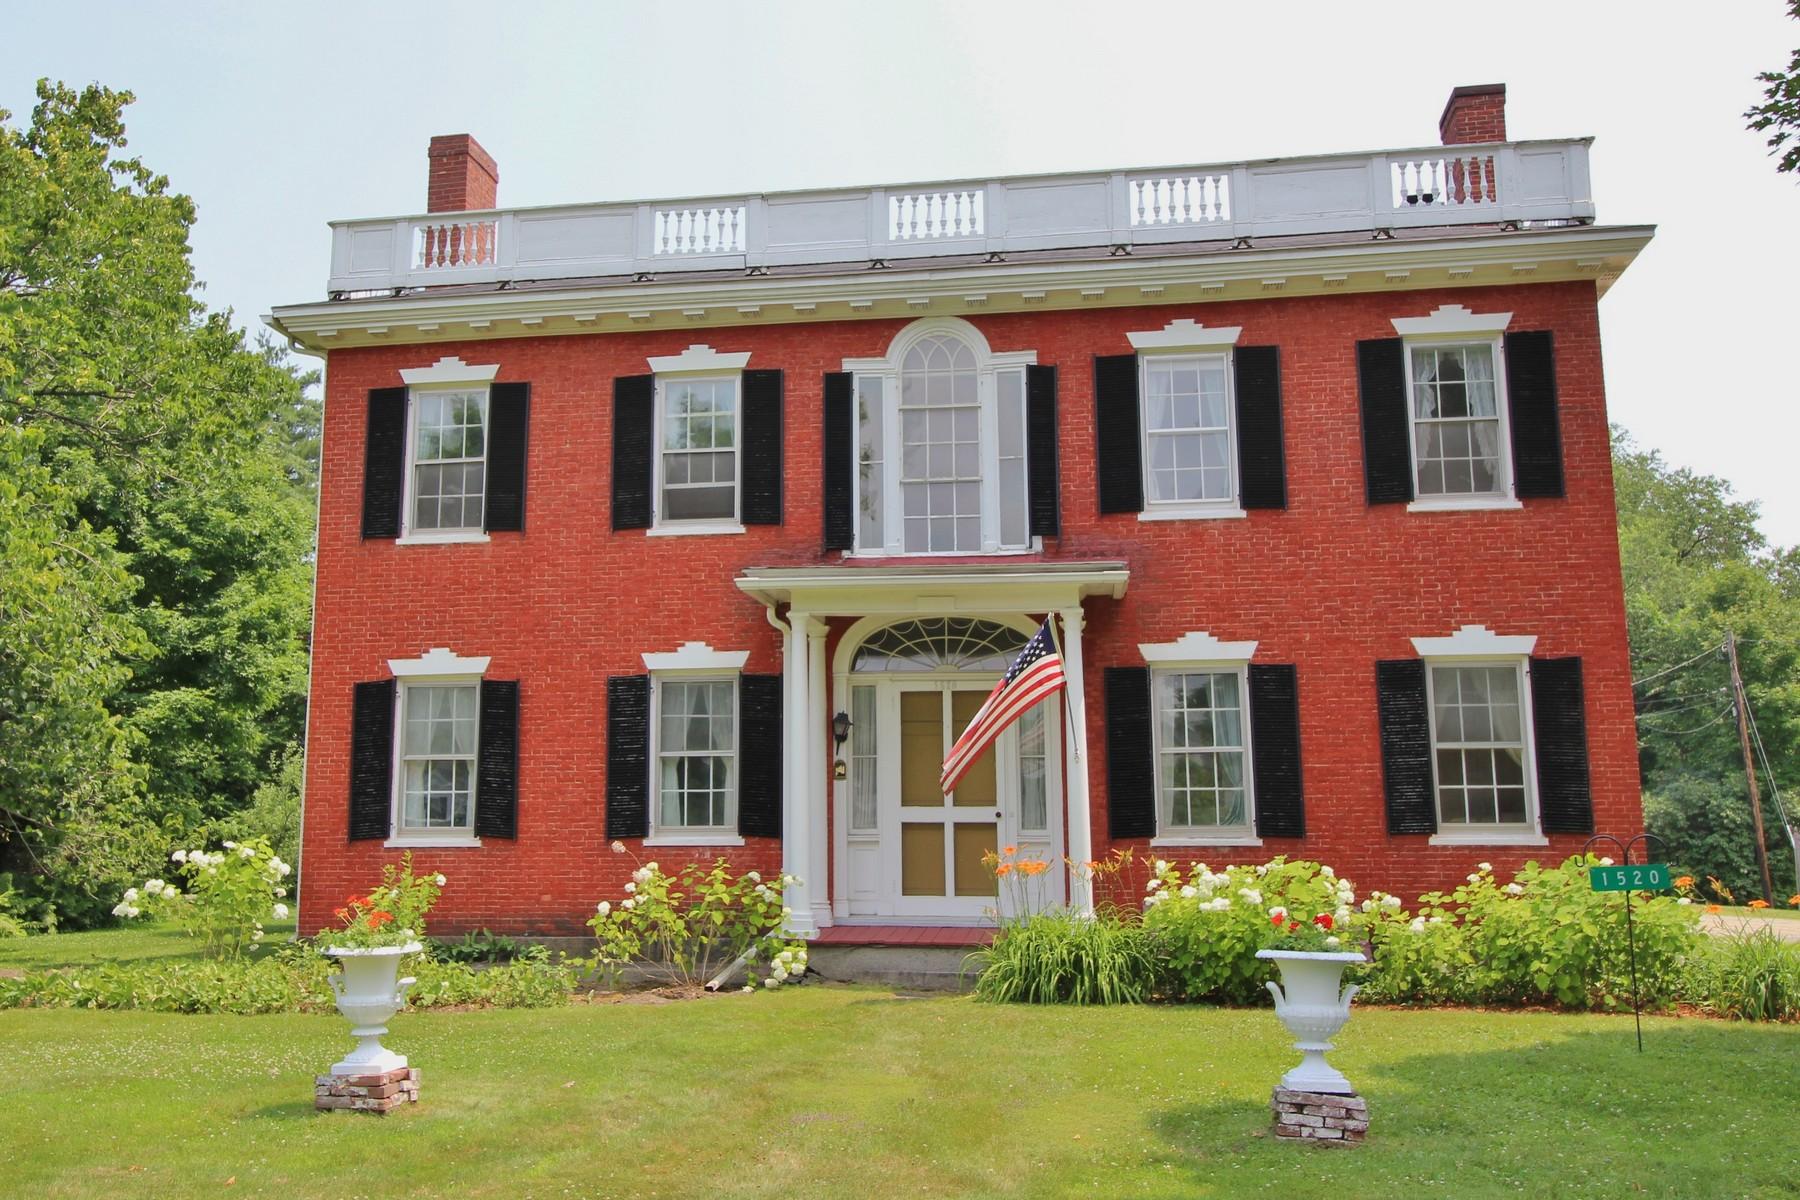 Villa per Vendita alle ore The Paddock House 1520 Main St St. Johnsbury, Vermont, 05819 Stati Uniti